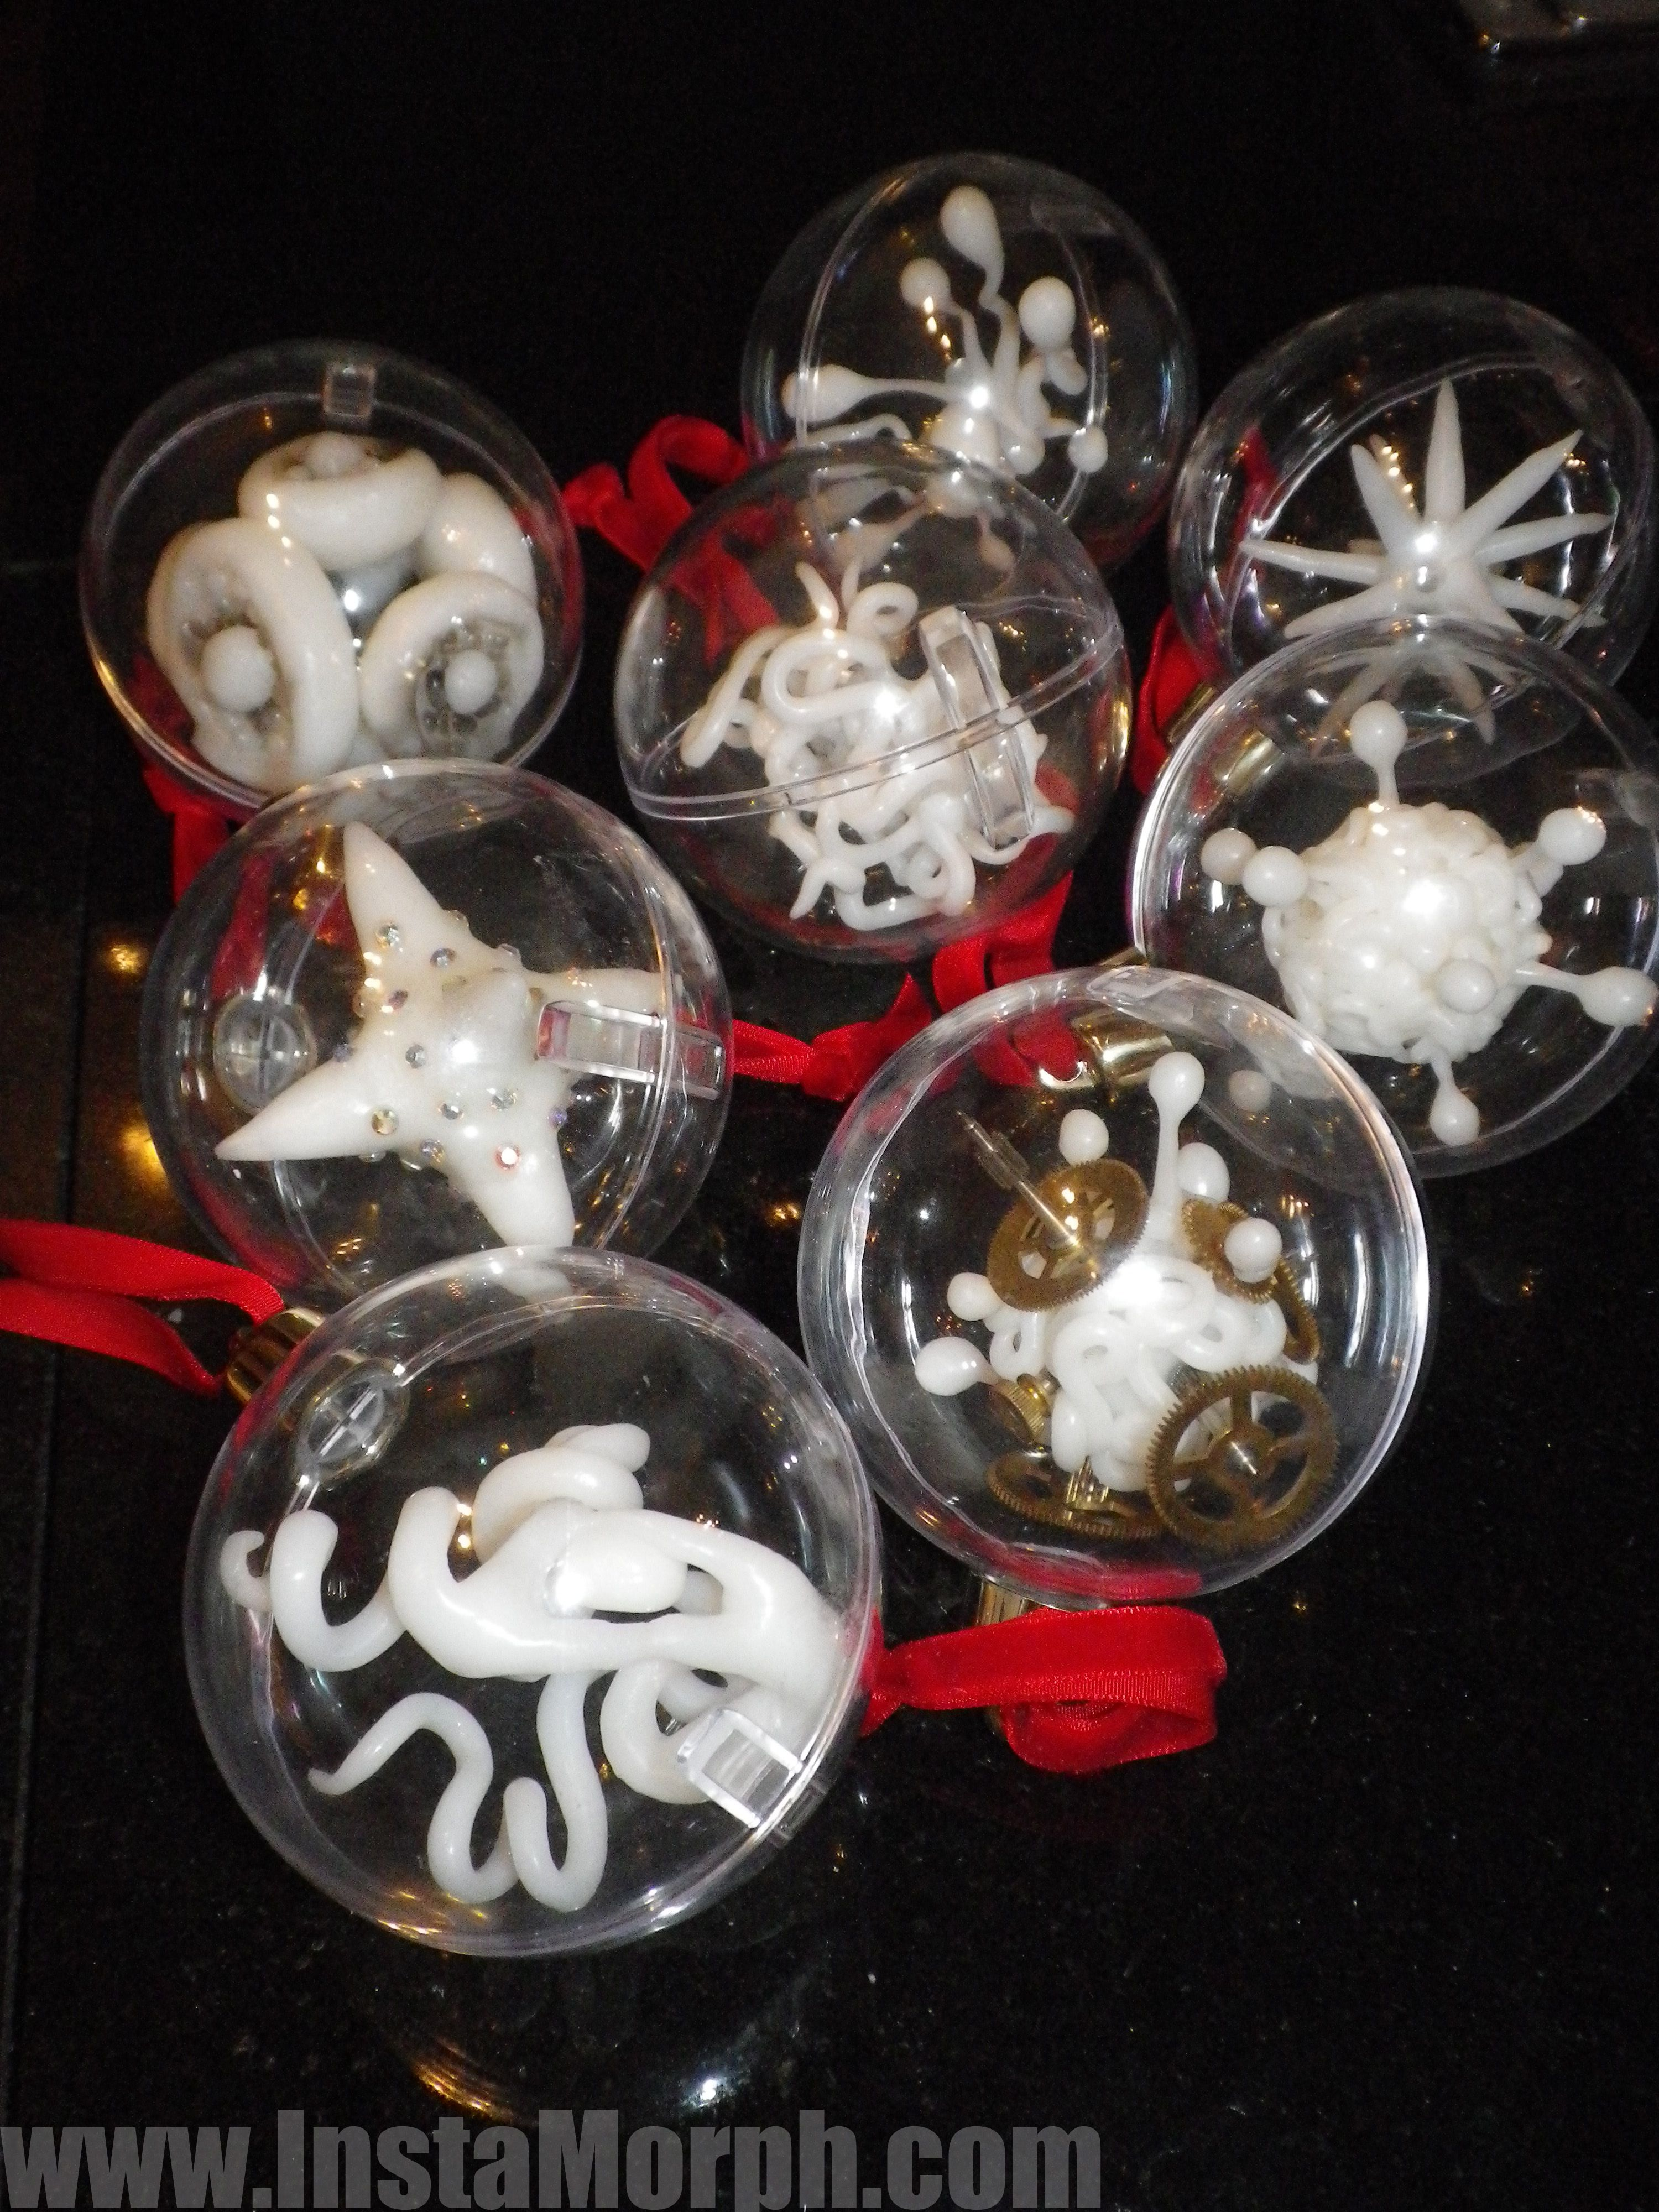 ornaments using instamorph plastic